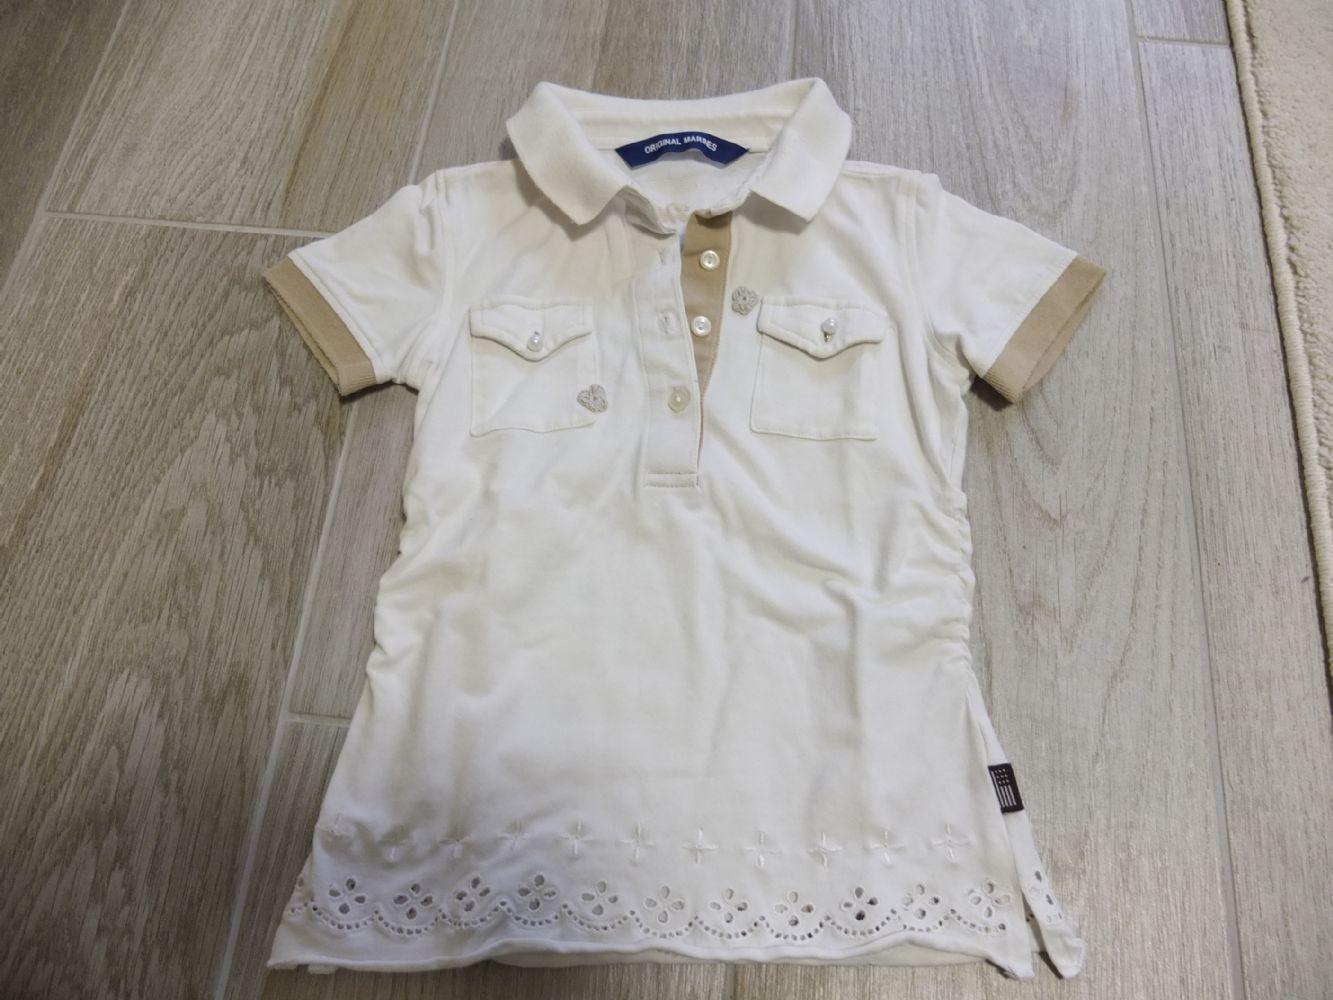 Shirt Bianca AnniBimbivestiti E ScarpeA 6 BarattoscambioT DYWEHI92